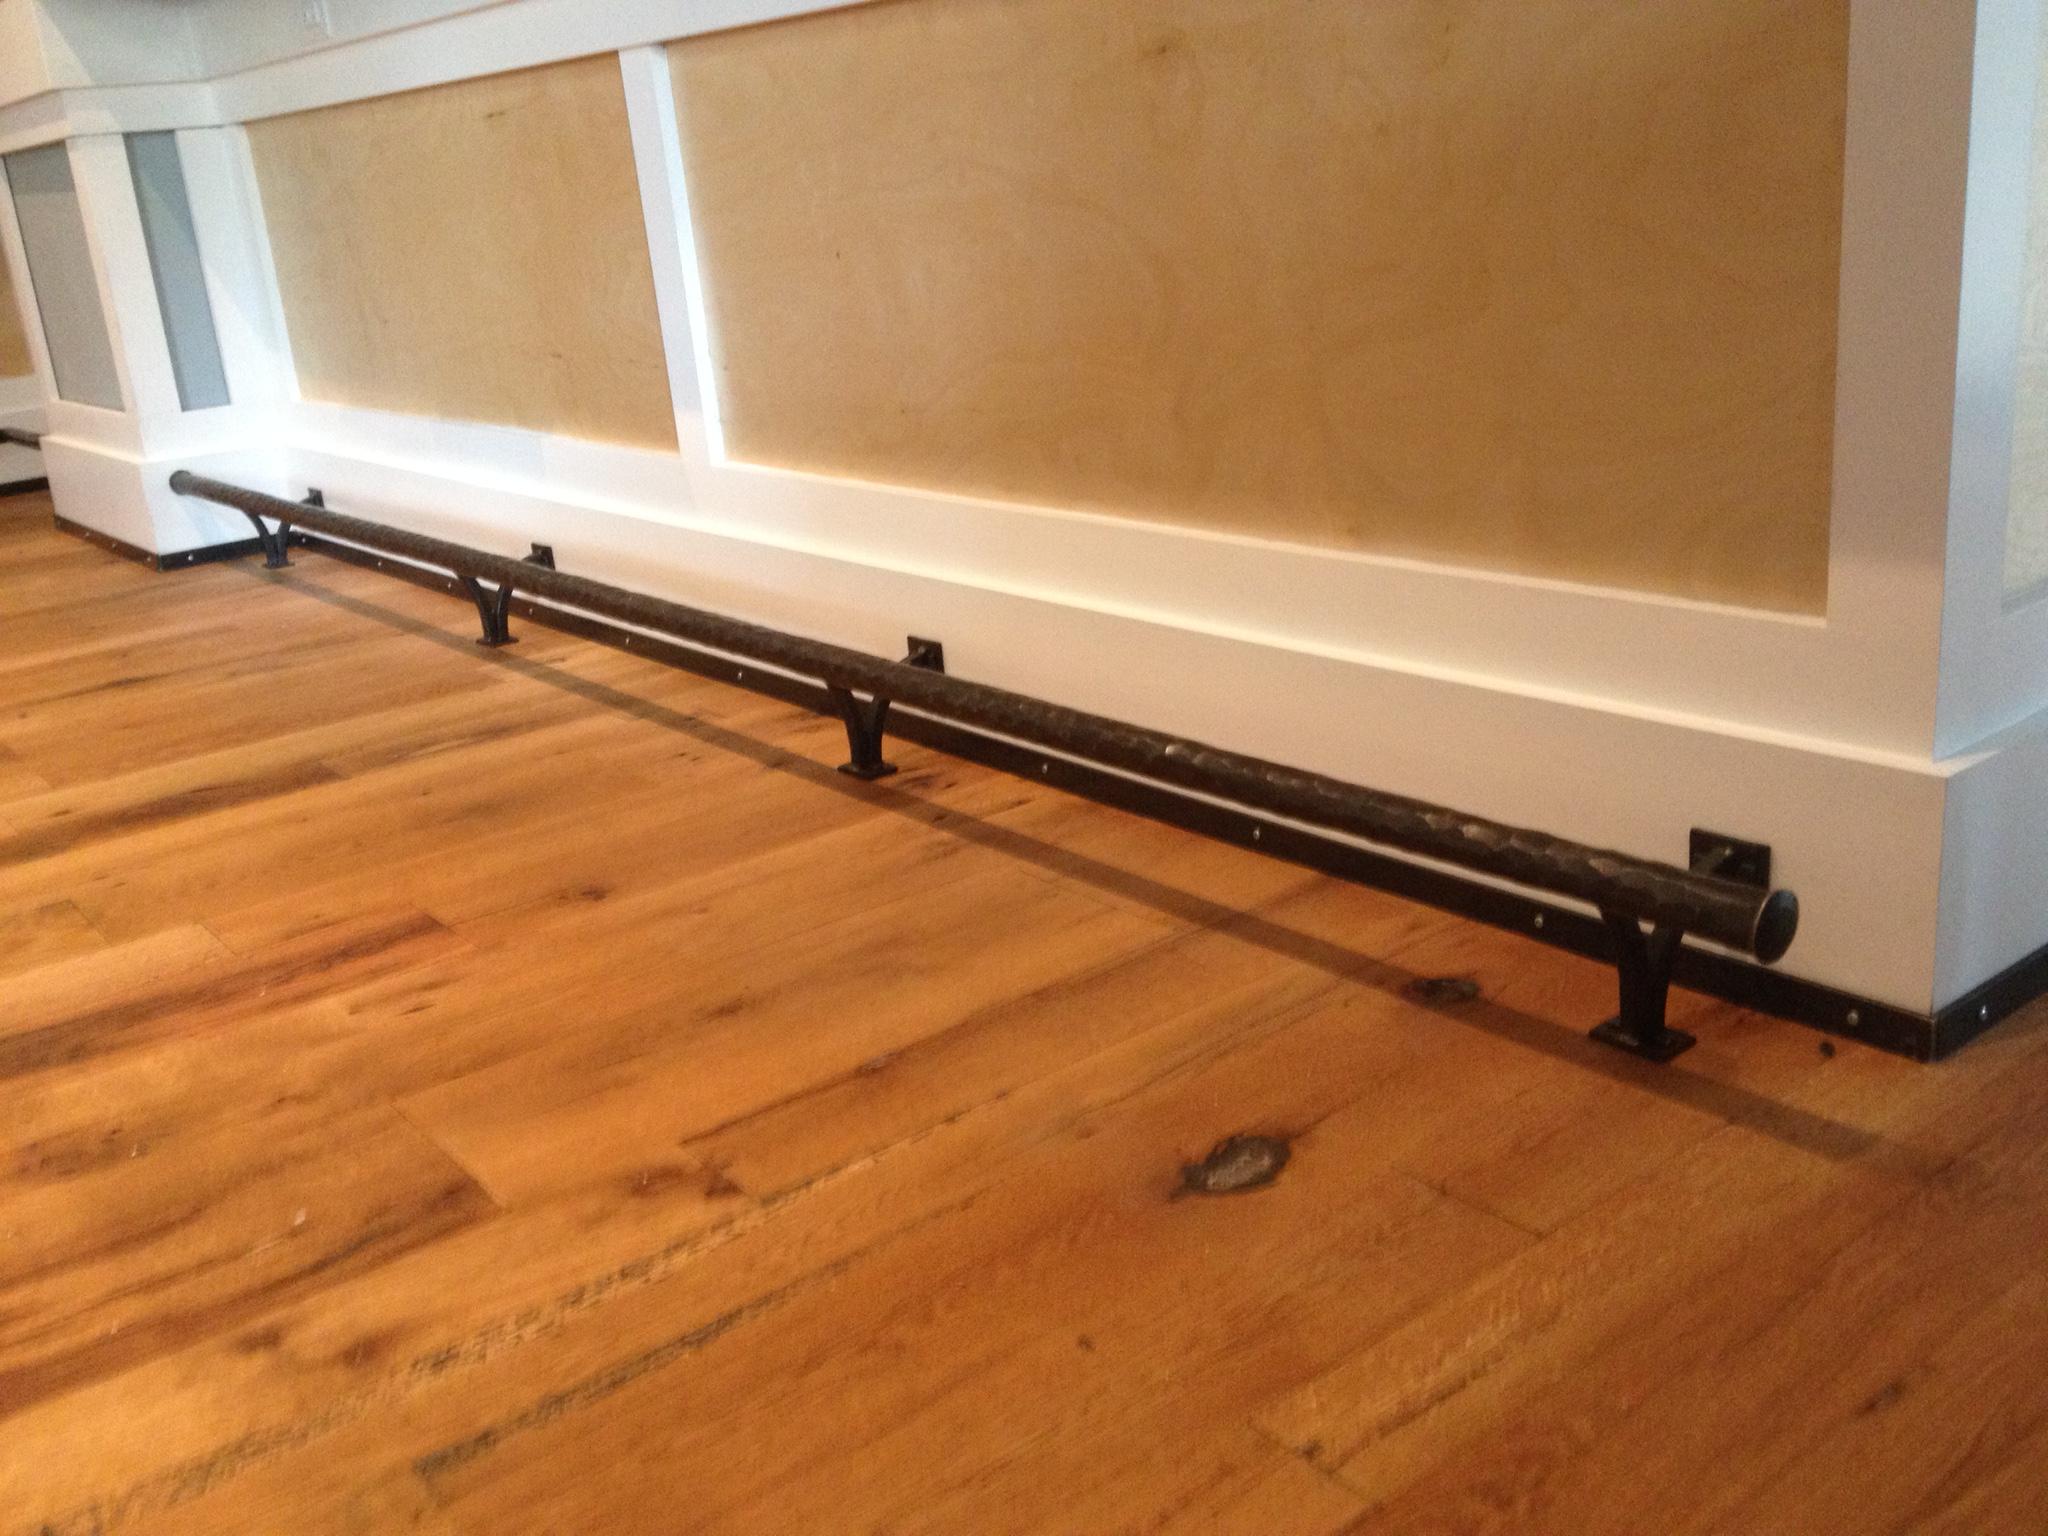 Hand forged bar rail by Phoenix Handcraft installed at Shagbark restaurant